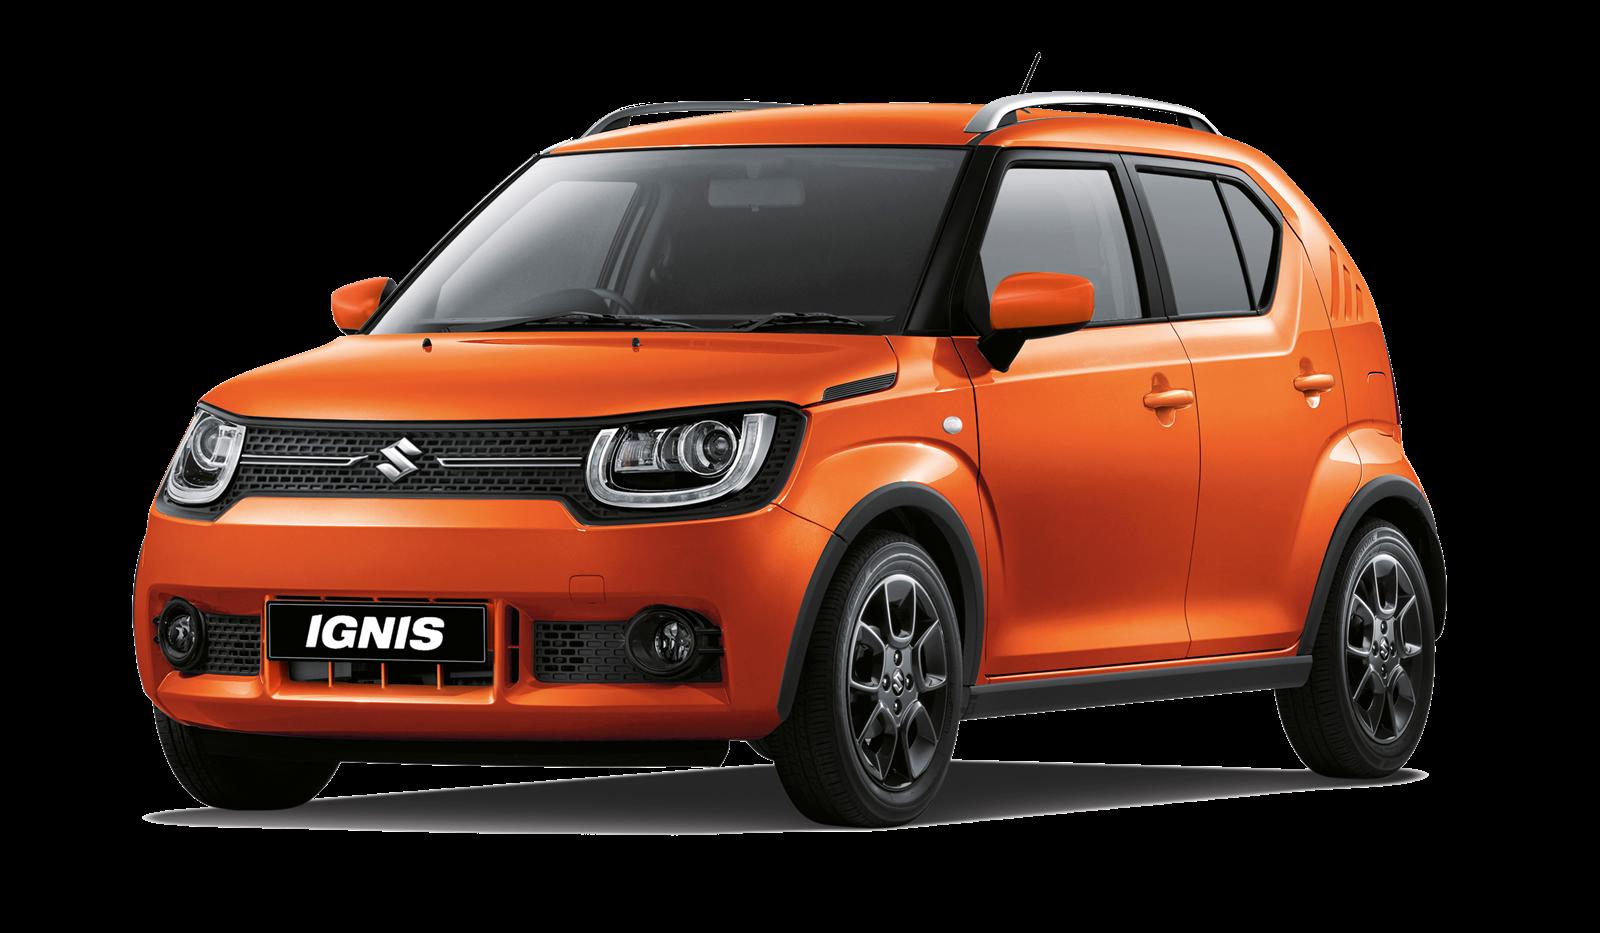 Suzuki Ignis 1.2 Dual Jet SZ-T SHVS